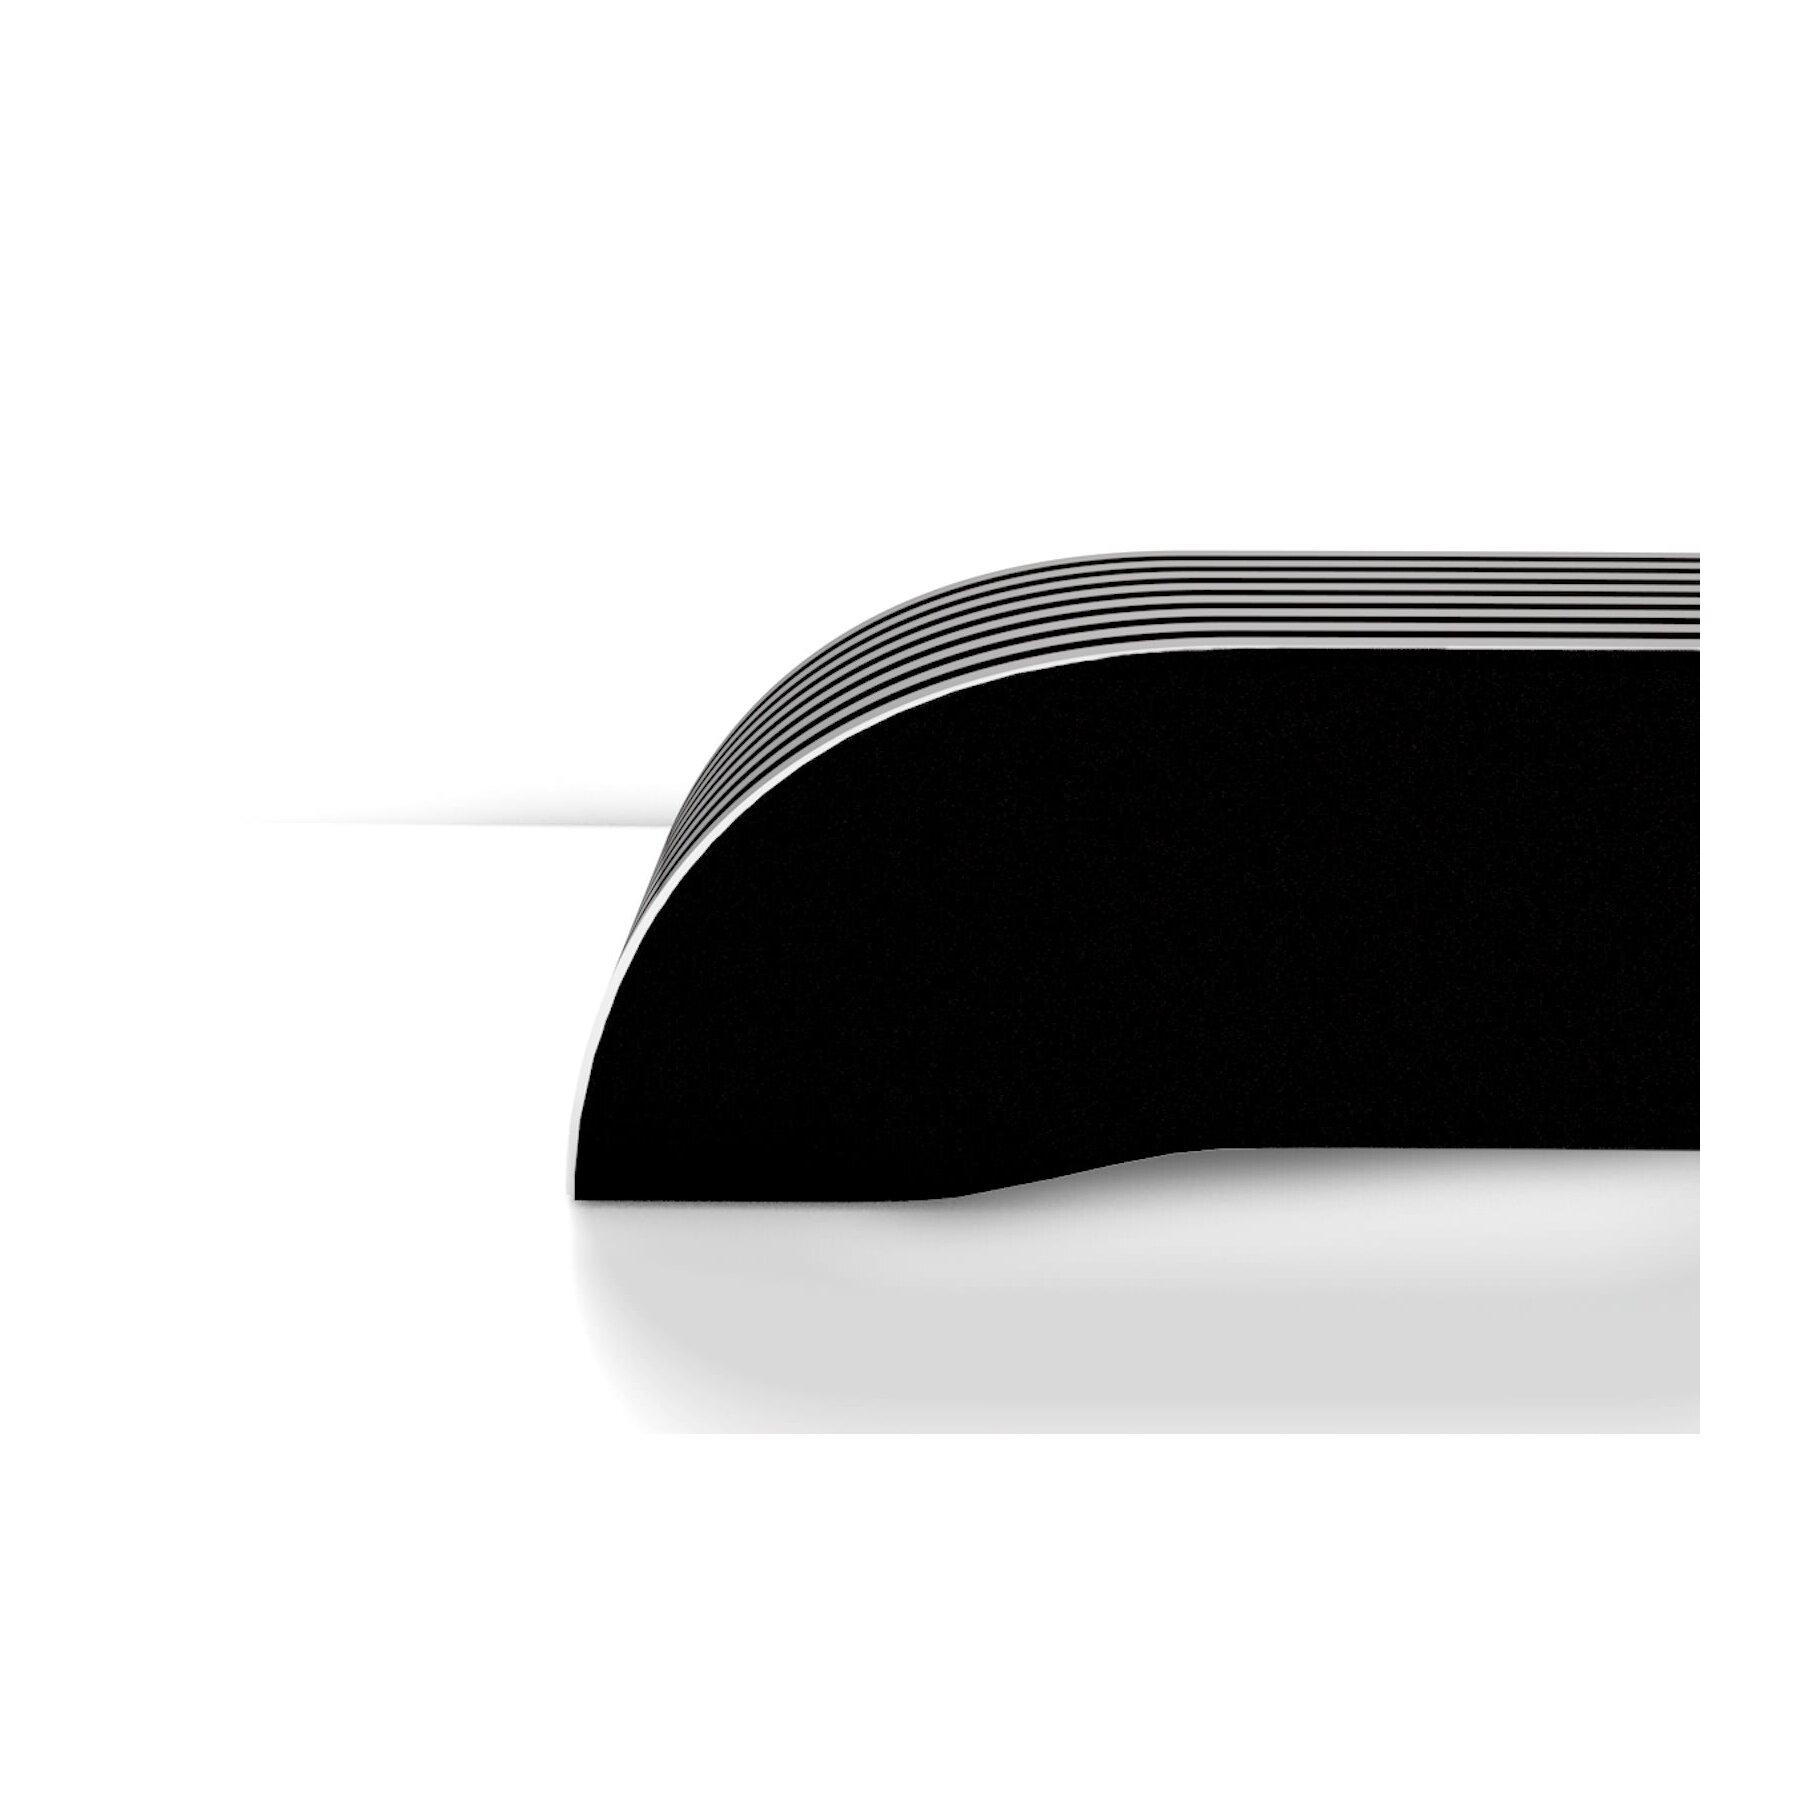 Moderner design heizk rper mit bodenanschluss for Design heizkorper